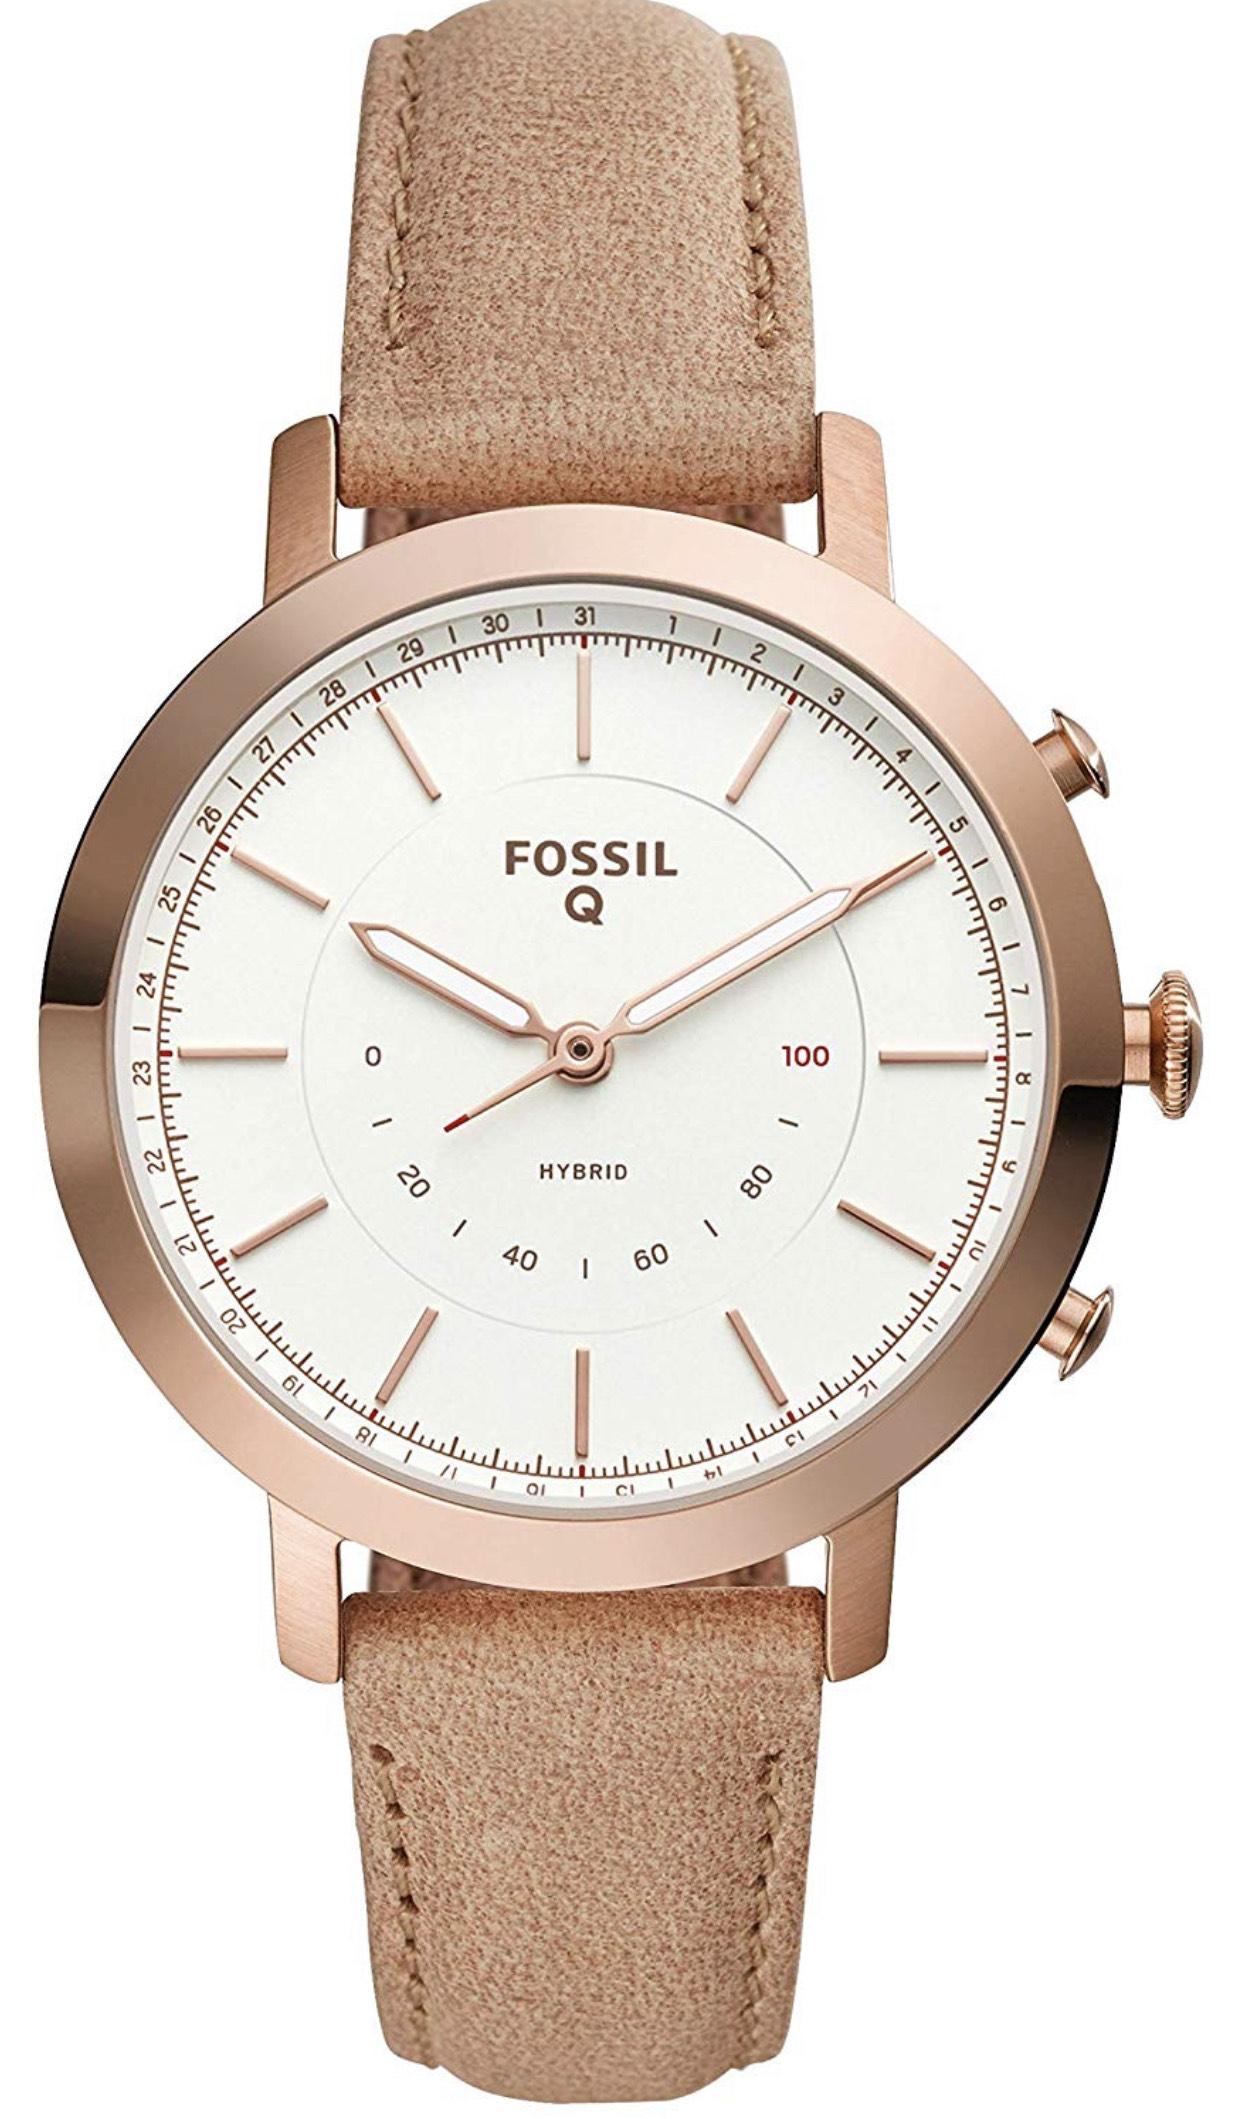 Amazon: Fossil Smartwatch Híbrido Análogo para Mujer